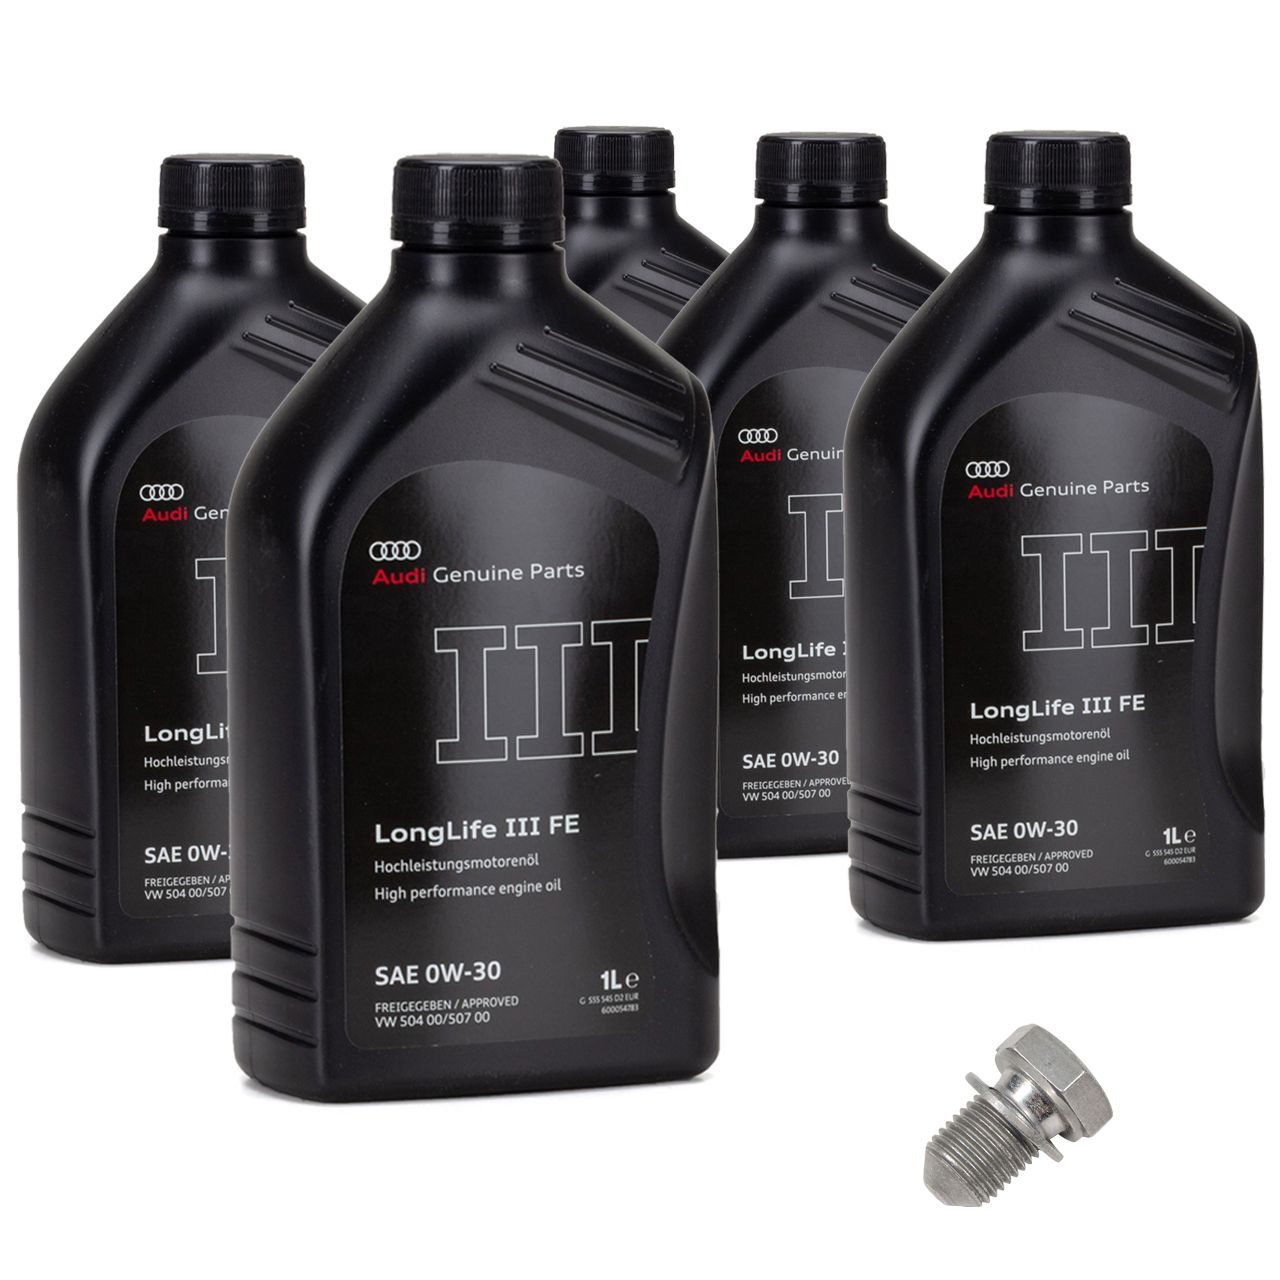 ORIGINAL AUDI Motoröl Öl Longlife 3 III SAE 0W-30 504.00 507.00 GS55545D2 - 5L + Schraube